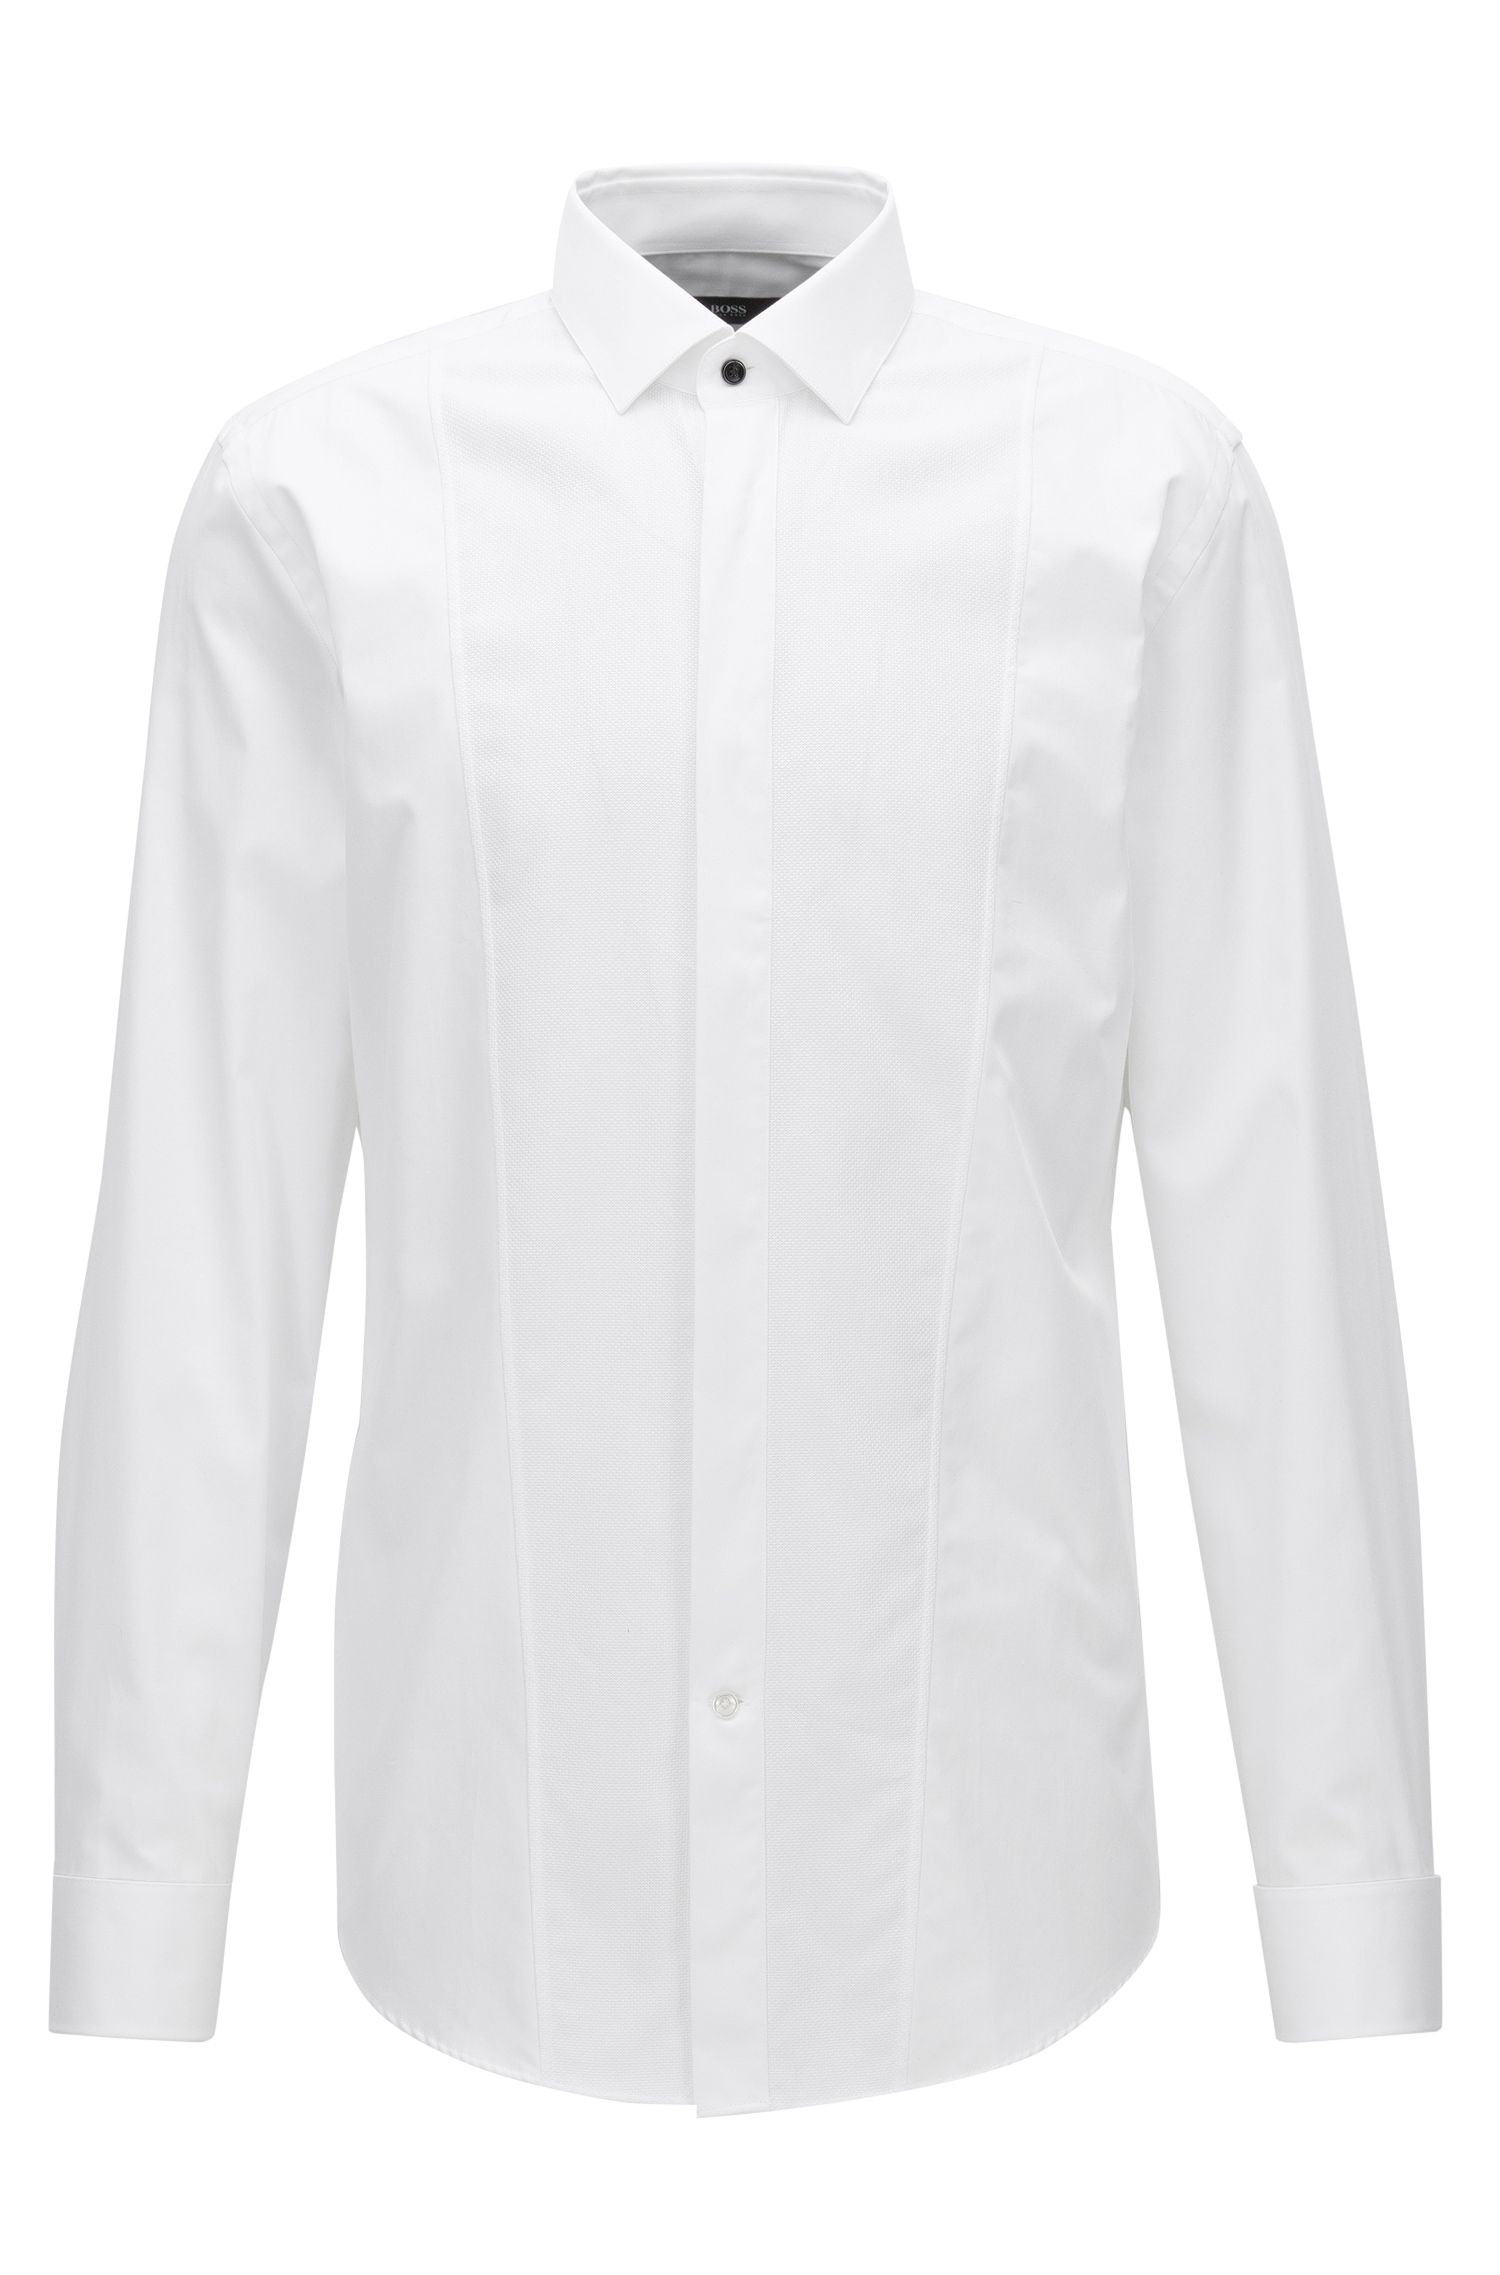 Dobby Bib Tuxedo Shirt, Slim Fit | Jarome, White